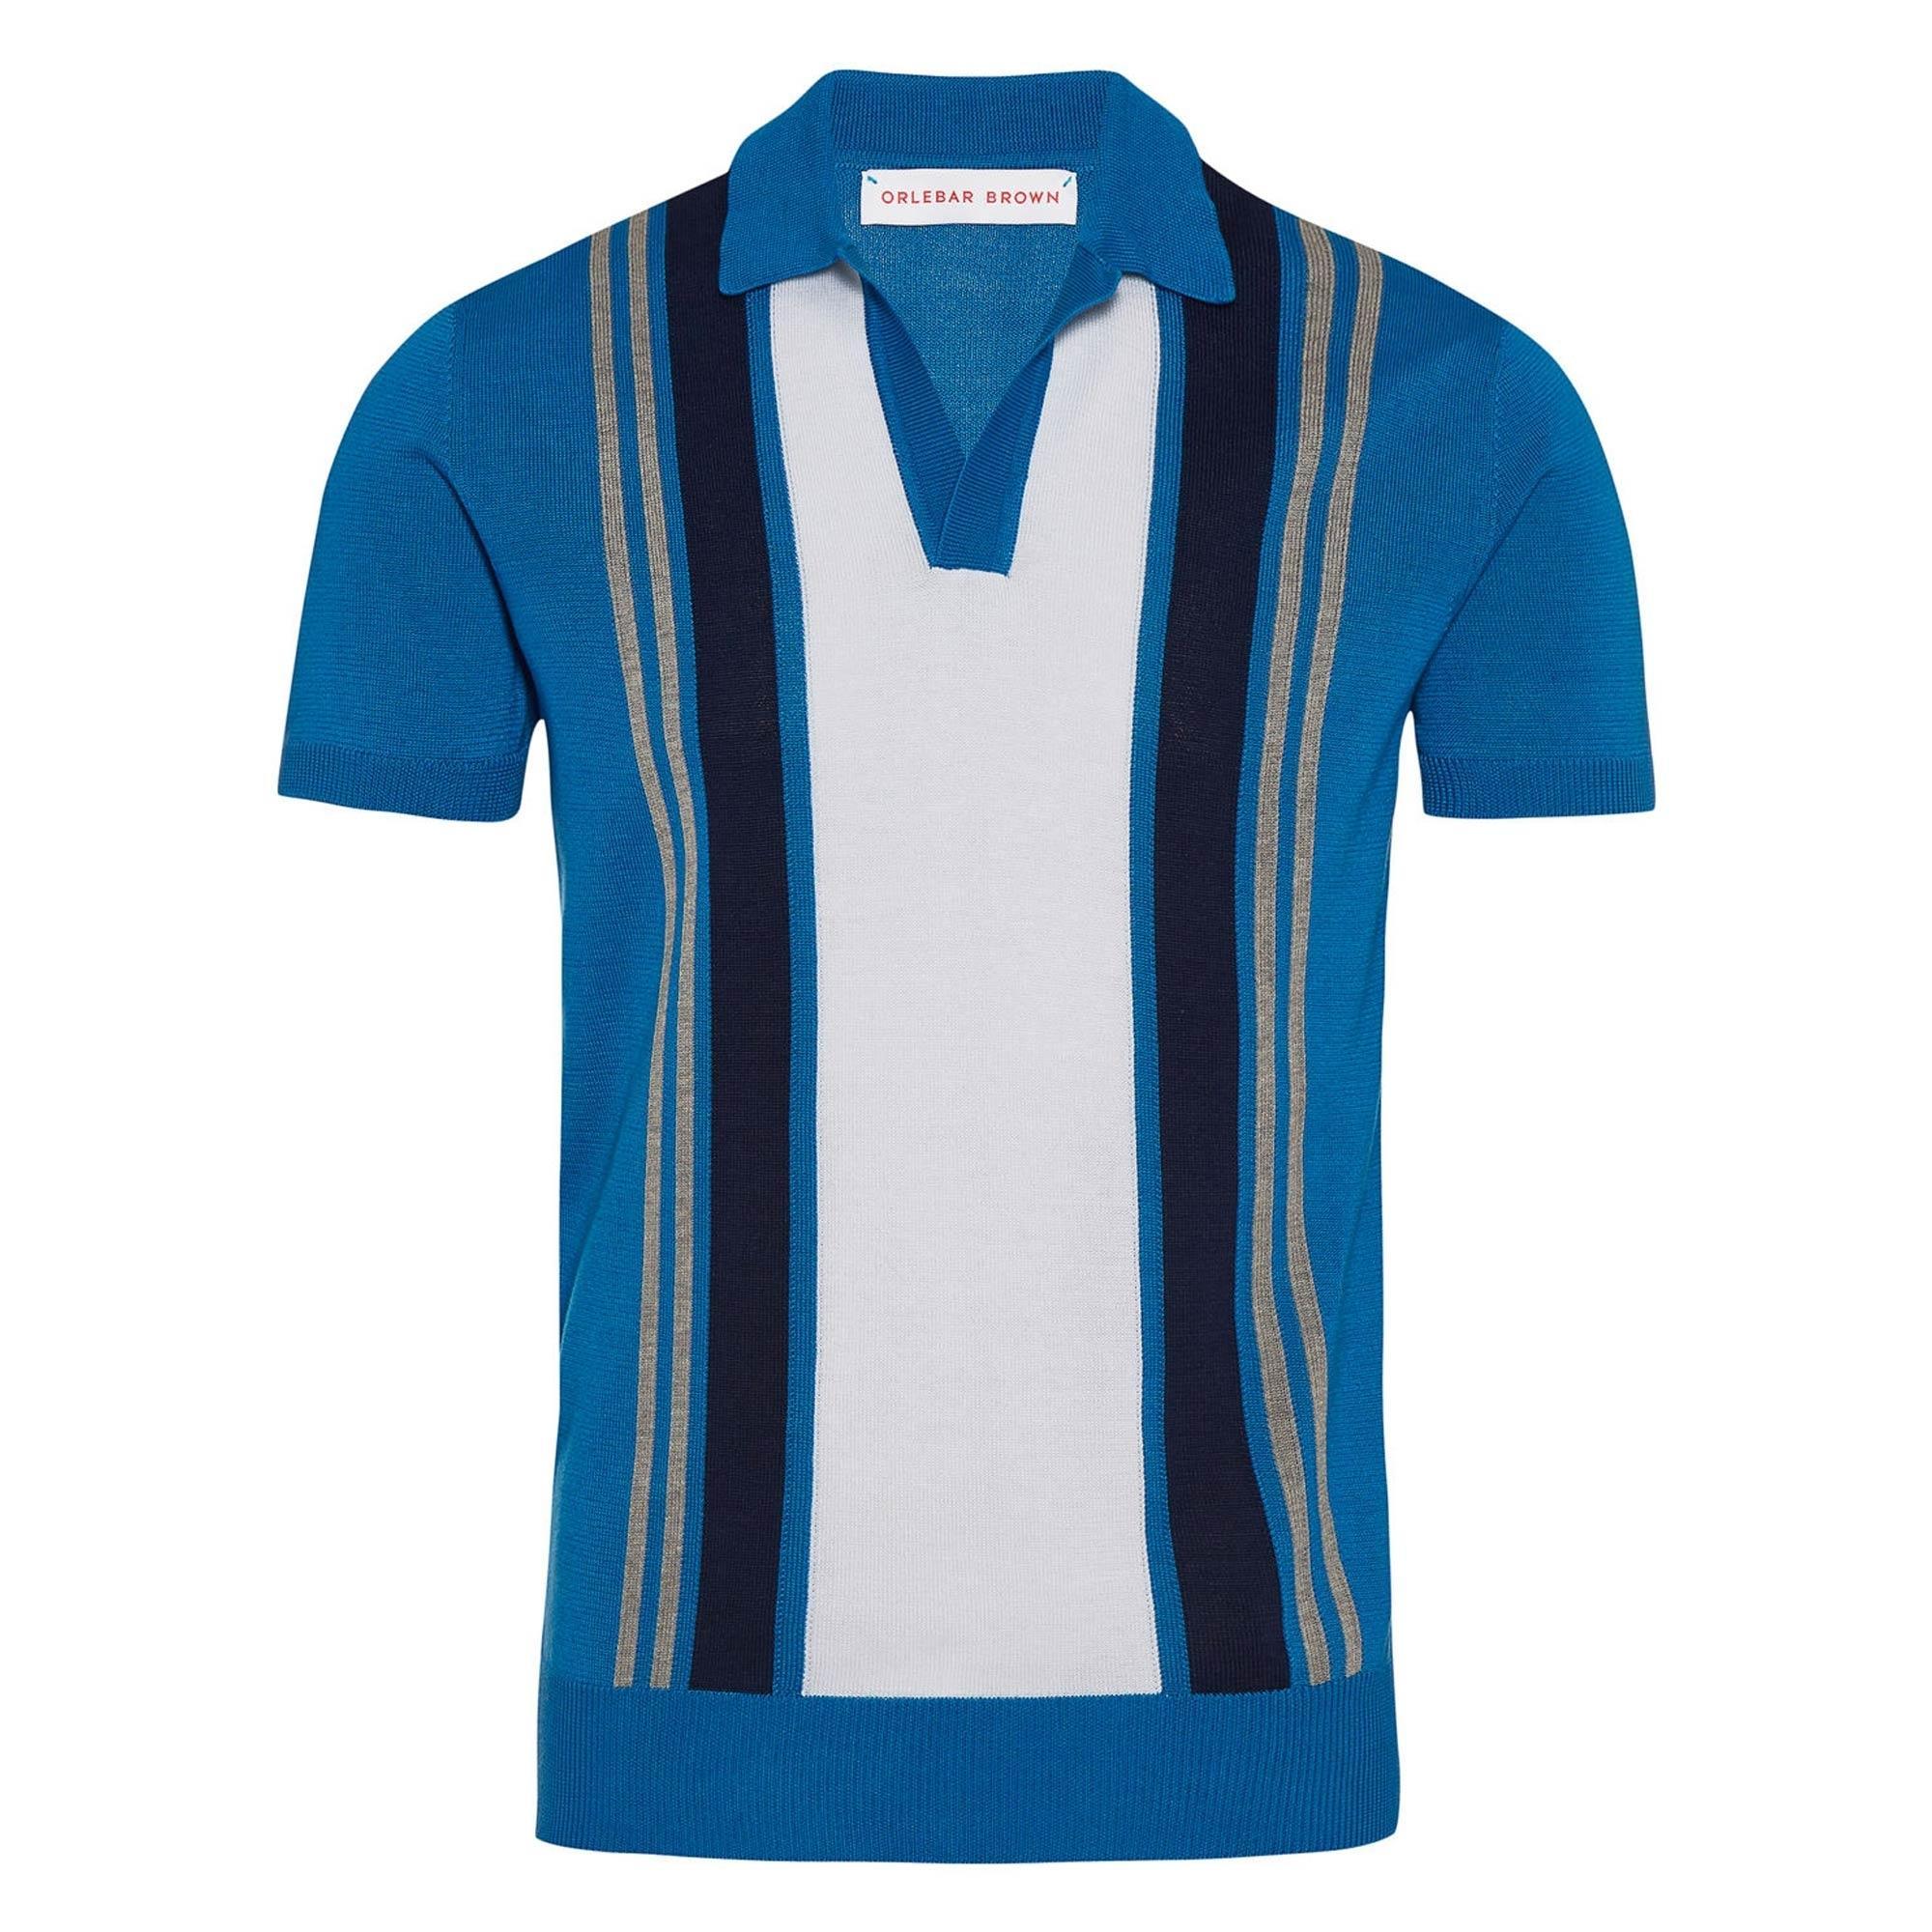 746d206ee Orlebar Brown Horton Vertical Stripe Polo Shirt in Blue for Men - Lyst